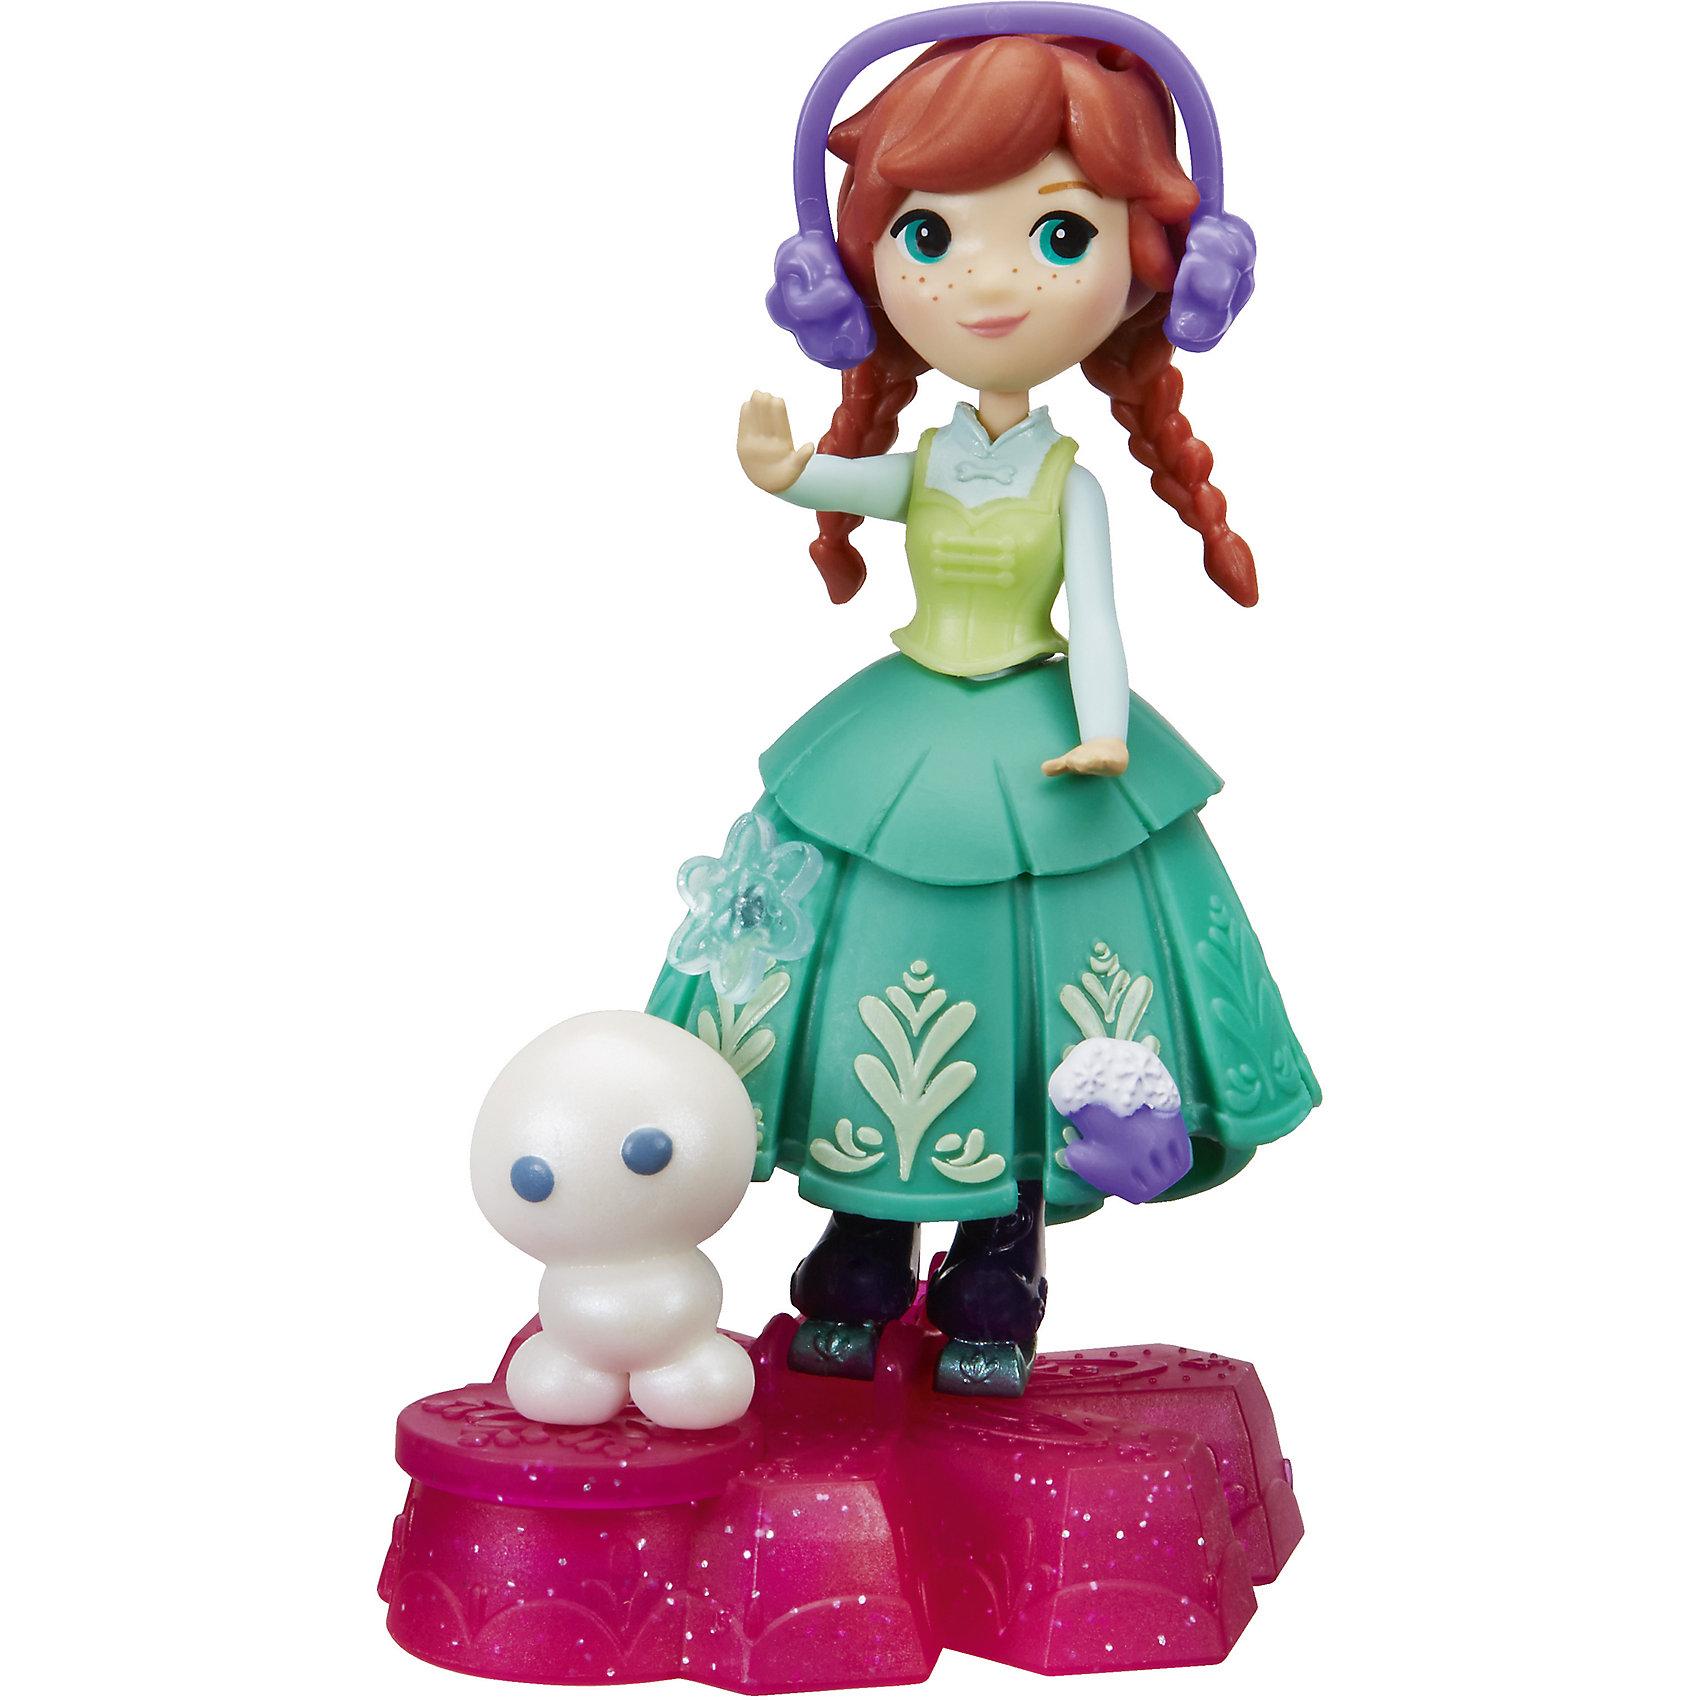 Маленькая кукла Холодное Сердце, HasbroМини-куклы<br><br><br>Ширина мм: 44<br>Глубина мм: 178<br>Высота мм: 178<br>Вес г: 92<br>Возраст от месяцев: 48<br>Возраст до месяцев: 2147483647<br>Пол: Женский<br>Возраст: Детский<br>SKU: 6943663